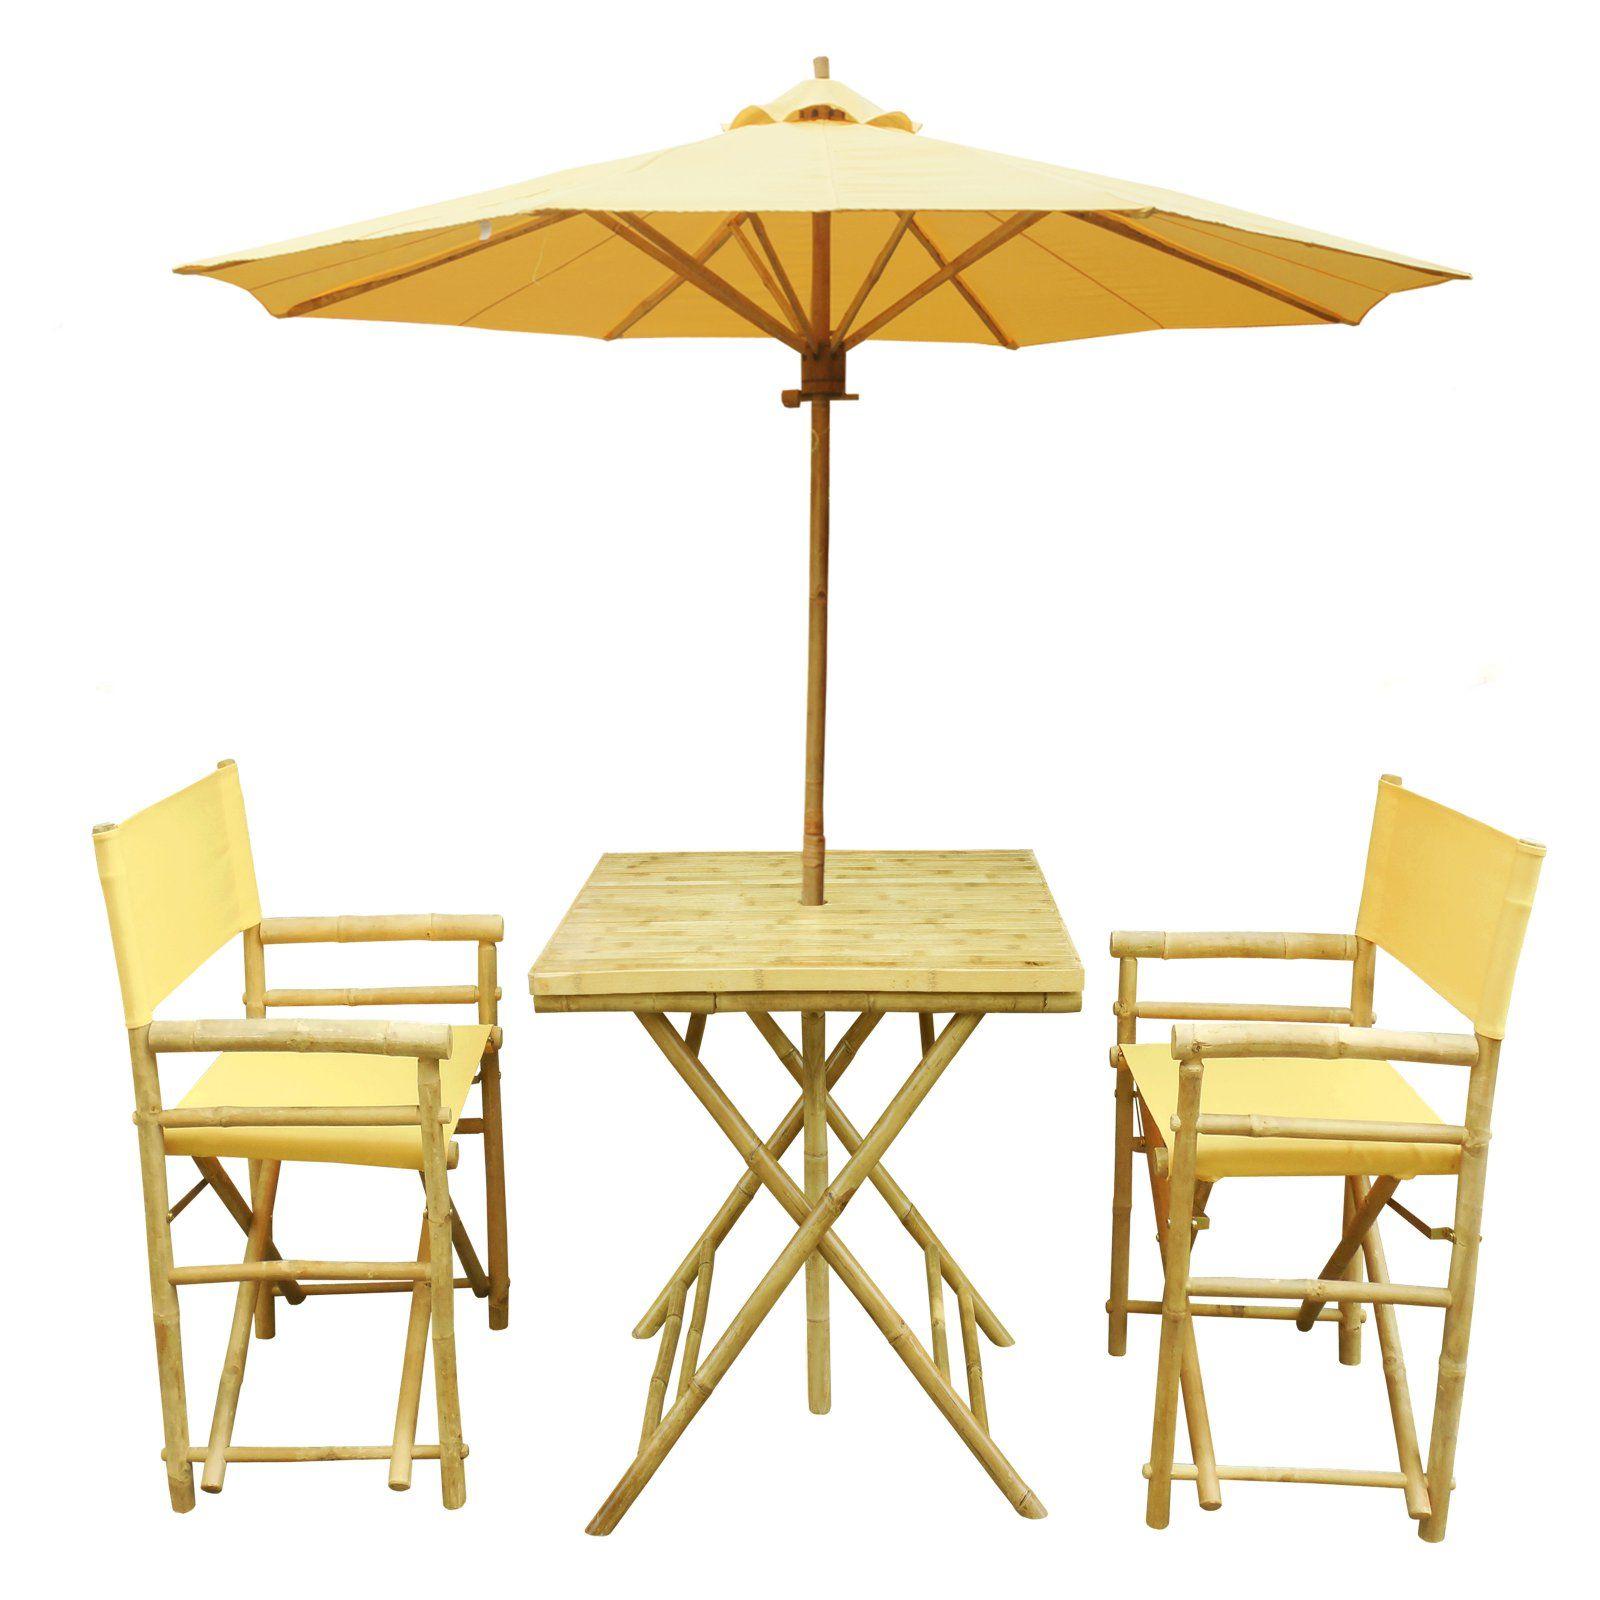 Statra Bamboo Square 3 Piece Patio Dining Set With Matching Umbrella Patio Dining Set 3 Piece Bistro Set Outdoor Dining Set